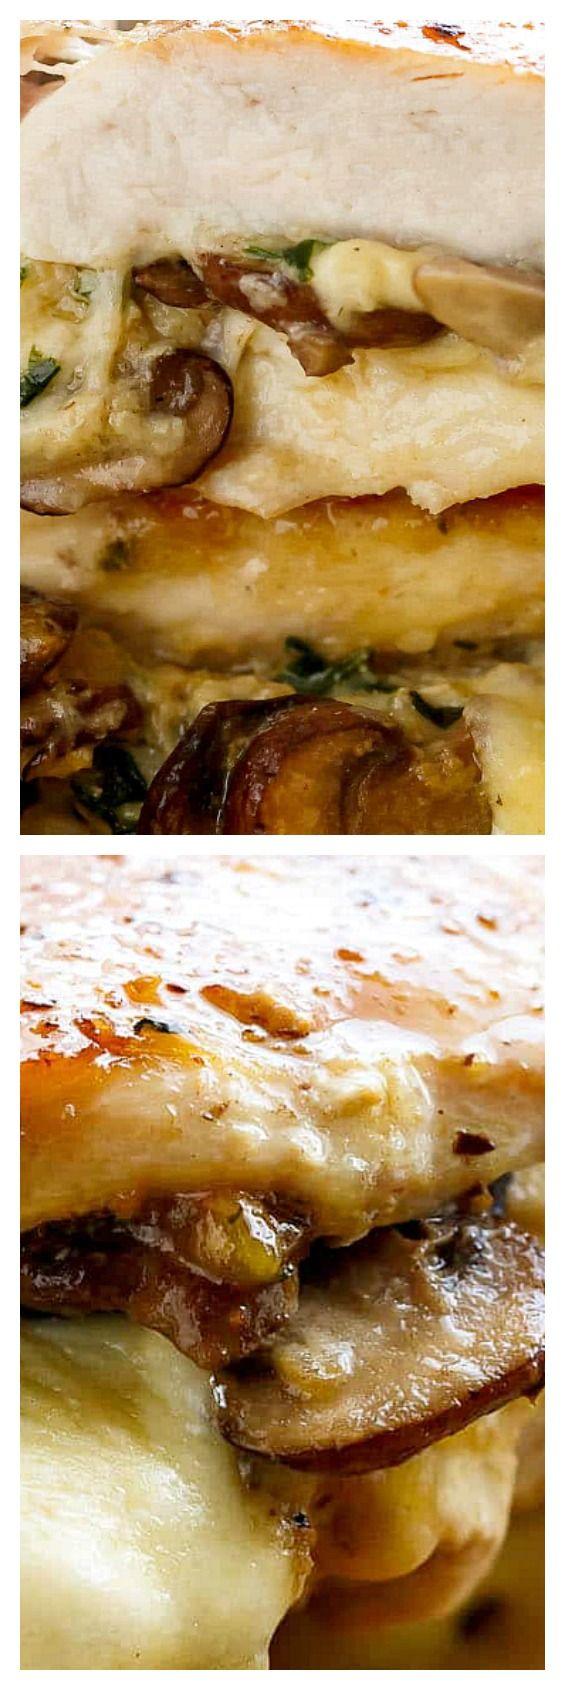 Cheesy Garlic Butter Mushroom Stuffed Chicken | Cooking ...